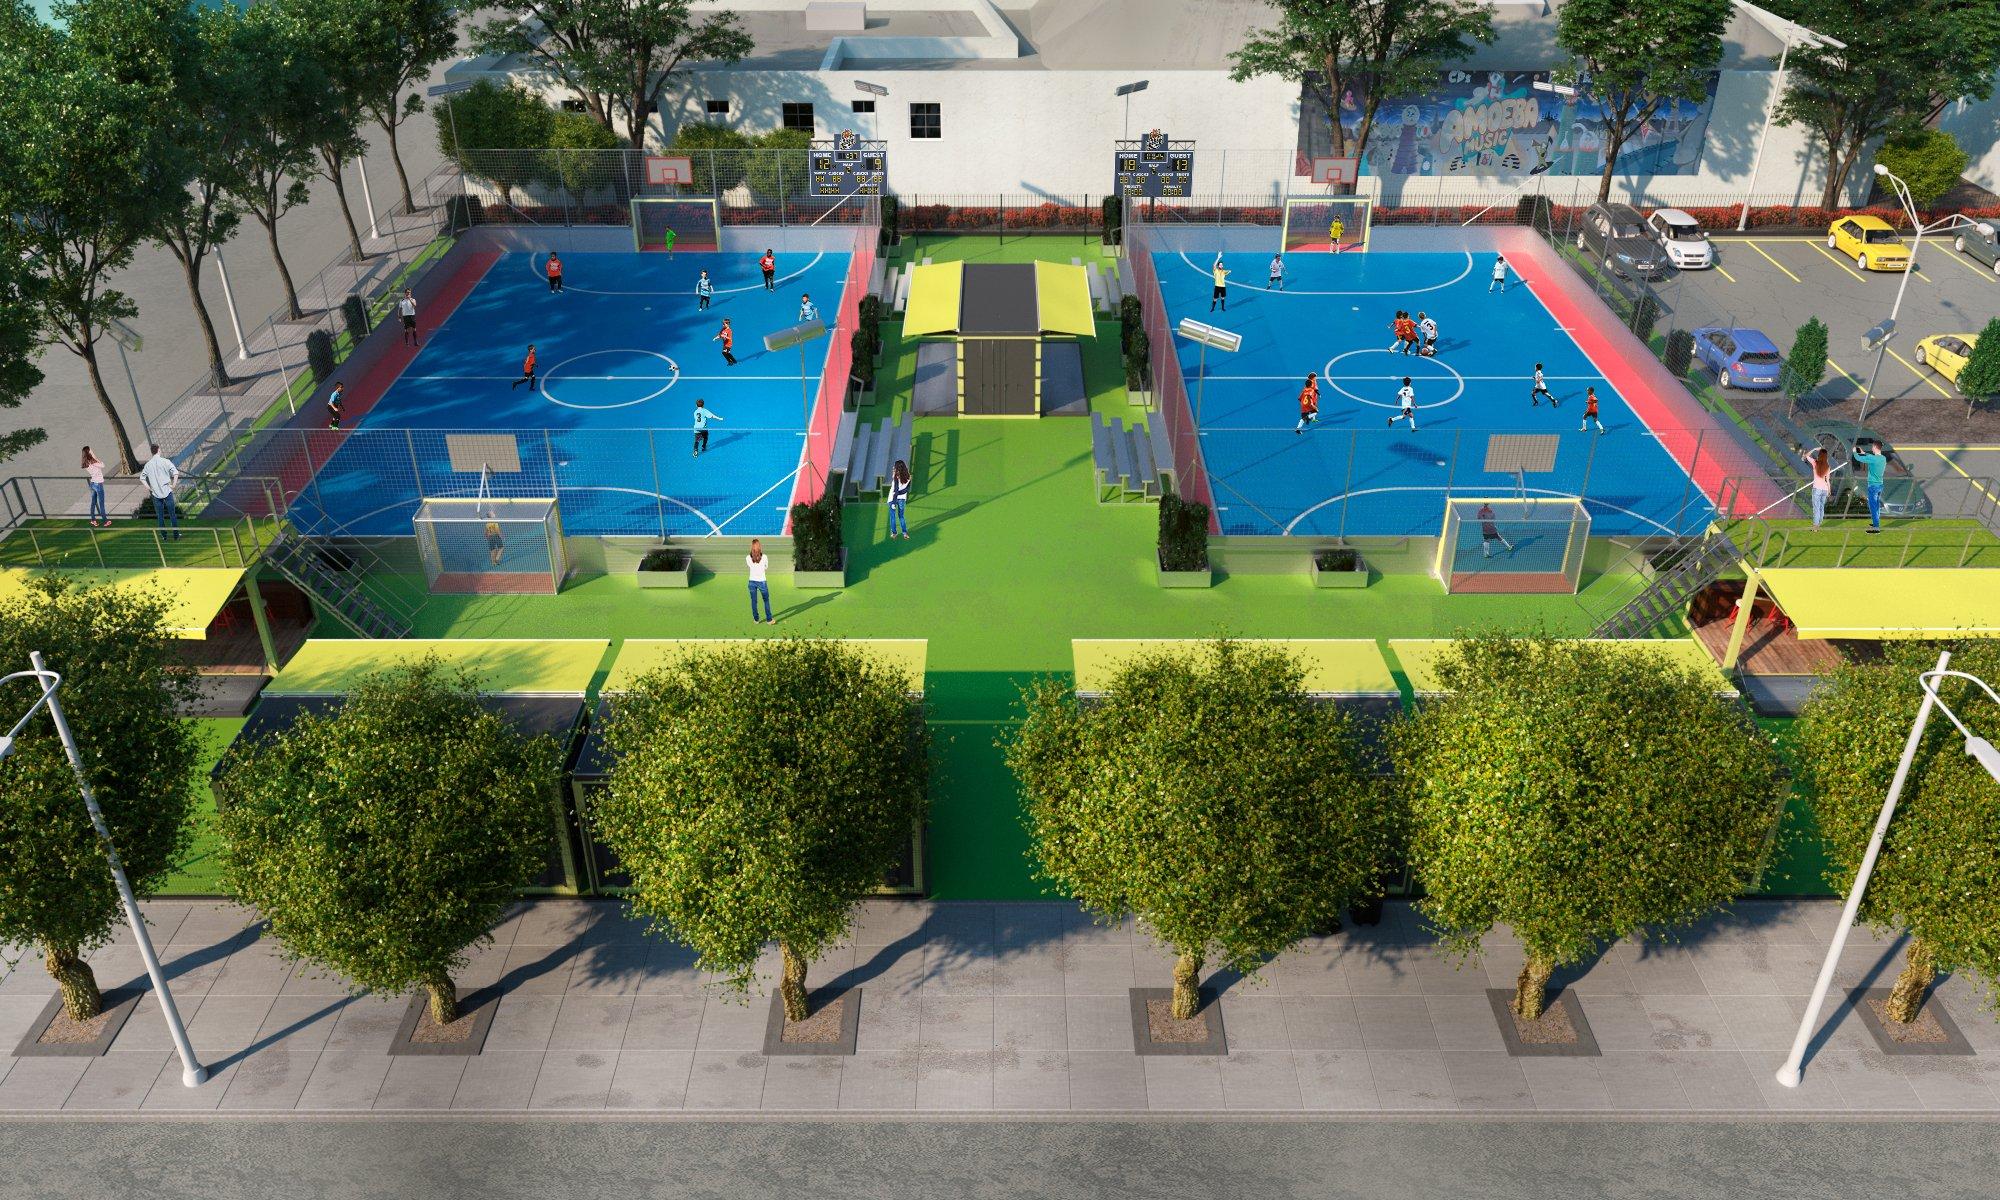 2019-Mc-Donalds-Parking-Futsal.jpg?width=2000&name=2019-Mc-Donalds-Parking-Futsal